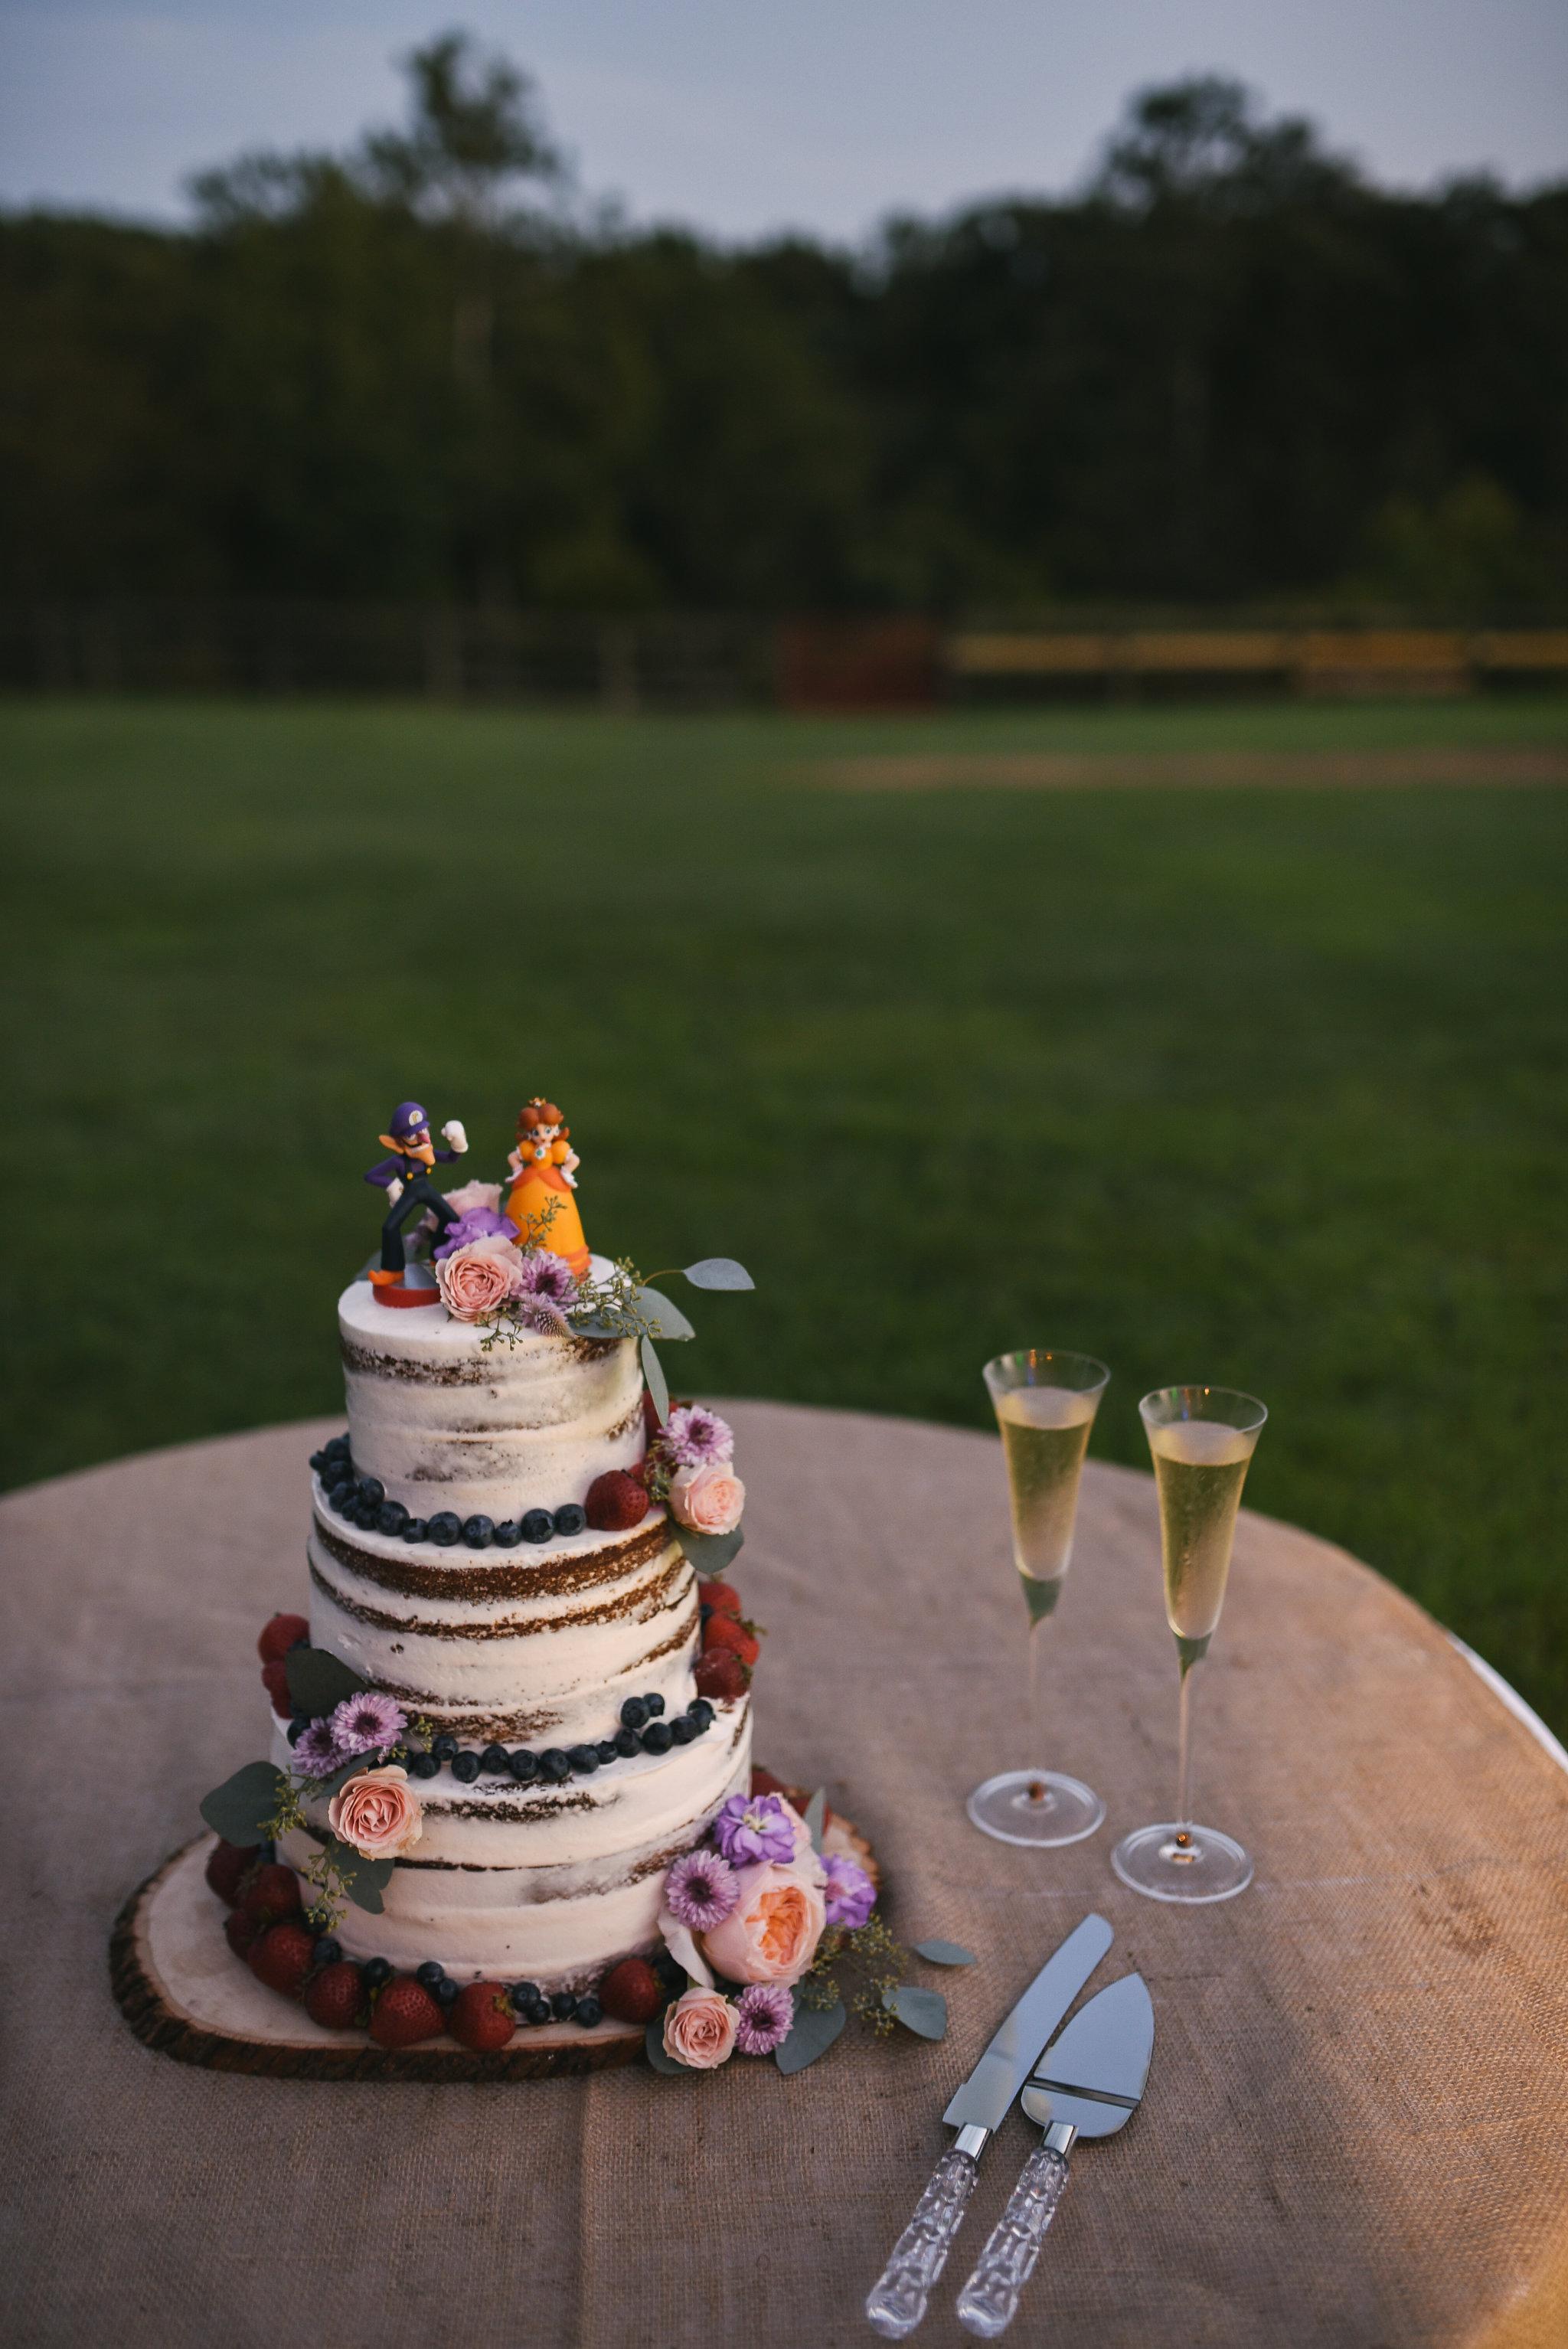 Maryland, Eastern Shore, Baltimore Wedding Photographer, Romantic, Boho, Backyard Wedding, Nature, Wedding Cake by Honey Hive Bakery, Mario Bros Cake Topper, Video Game Decor